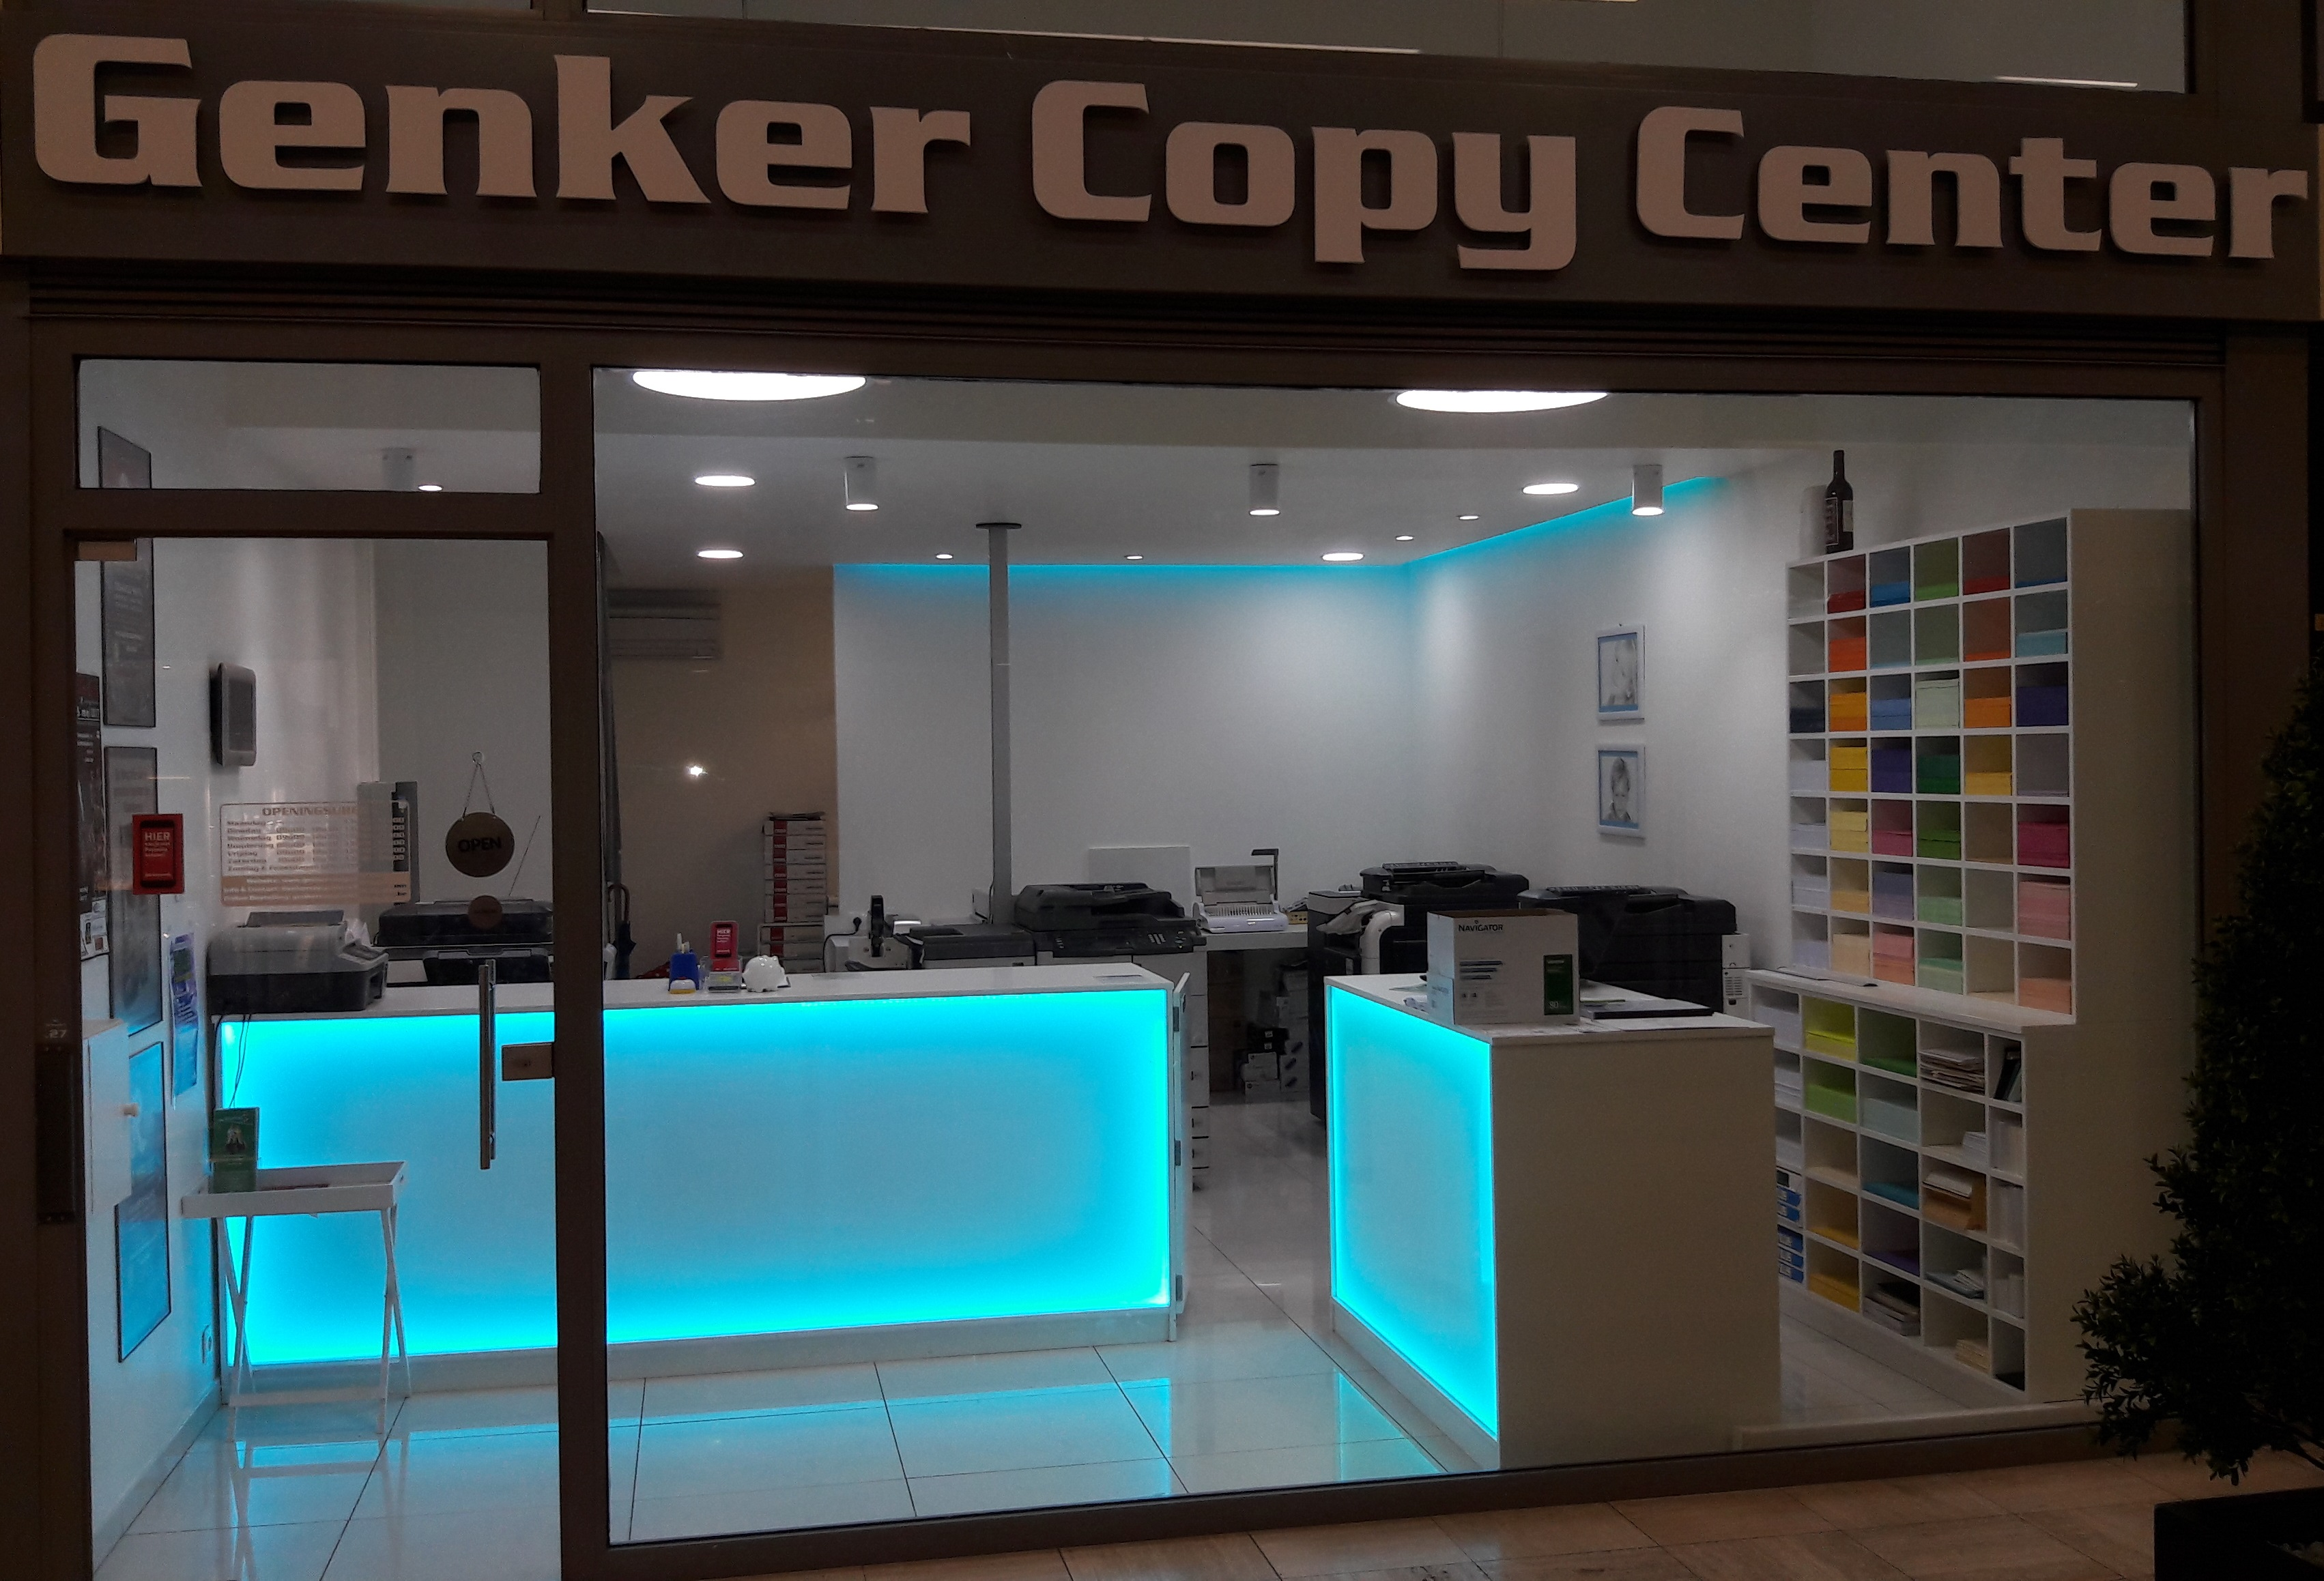 Genker Copy Center